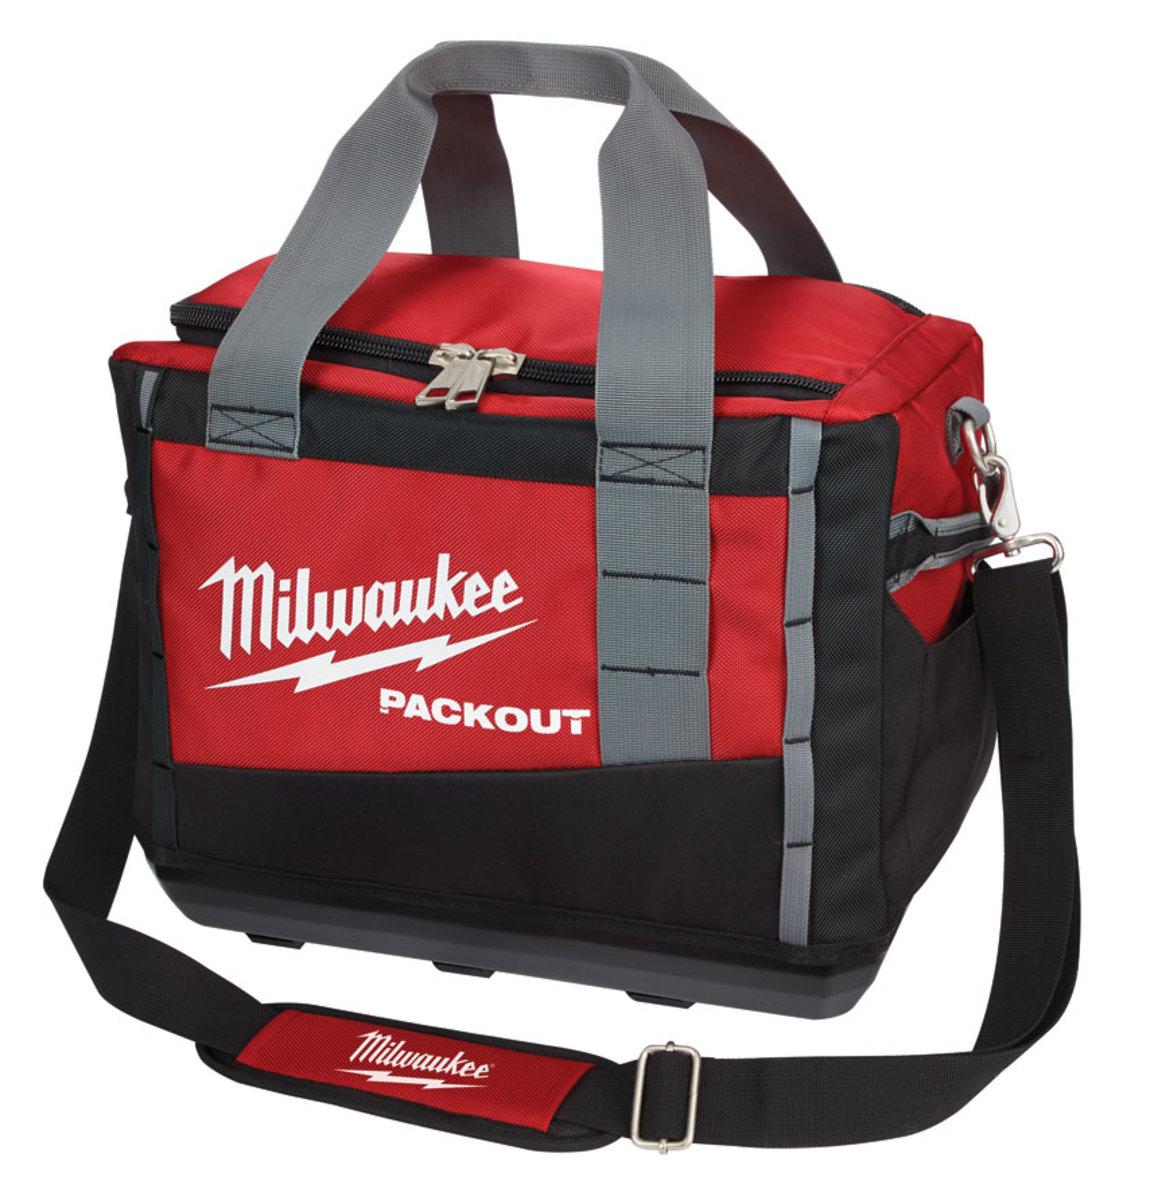 "The 15"" model 48-22-8315 tool bag."